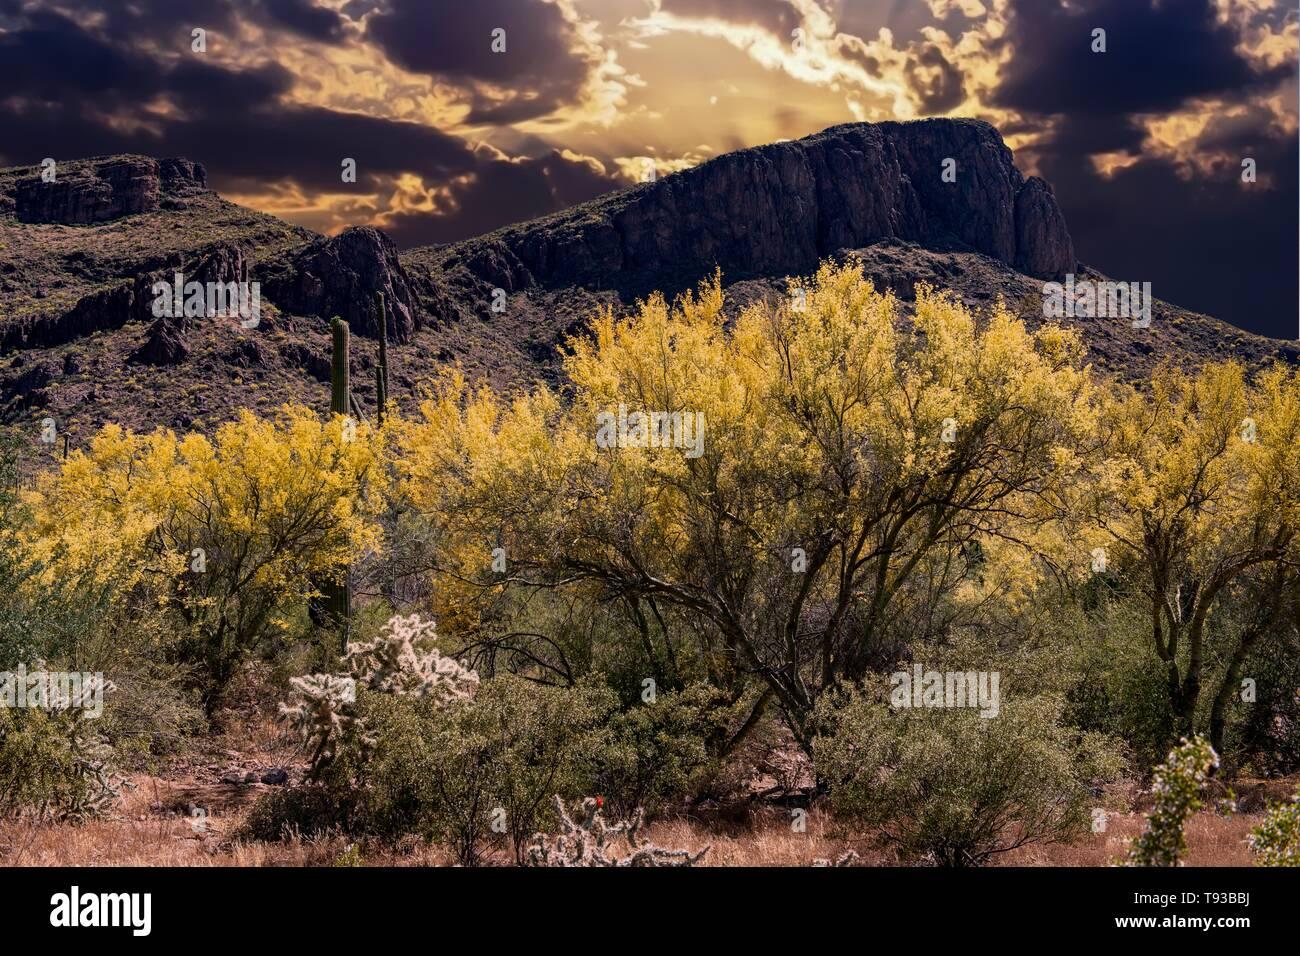 Foothill Paloverde (Parkinsonia microphylla) in bloom in Arizona Sonoran Desert - Stock Image